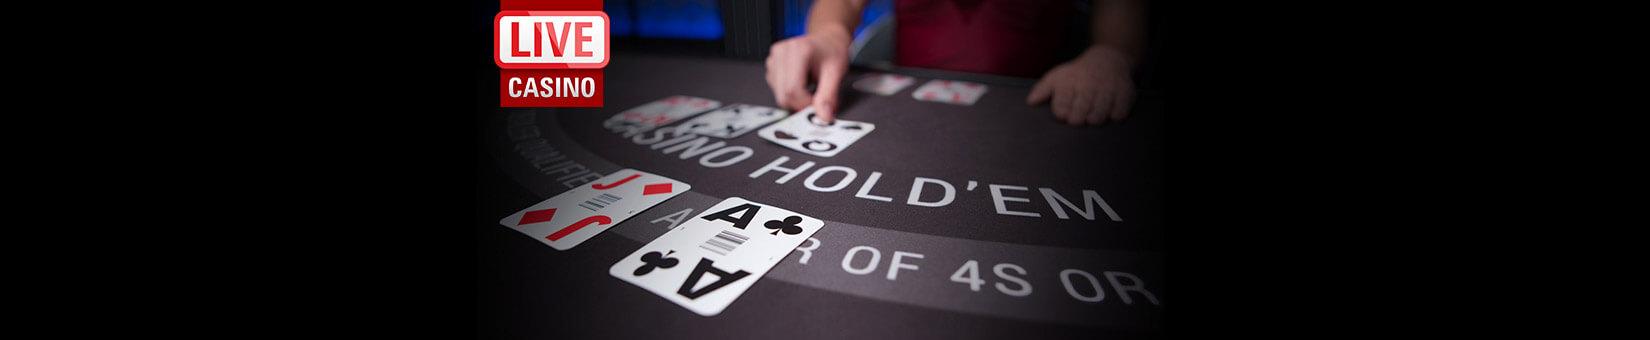 pokerstars казино live